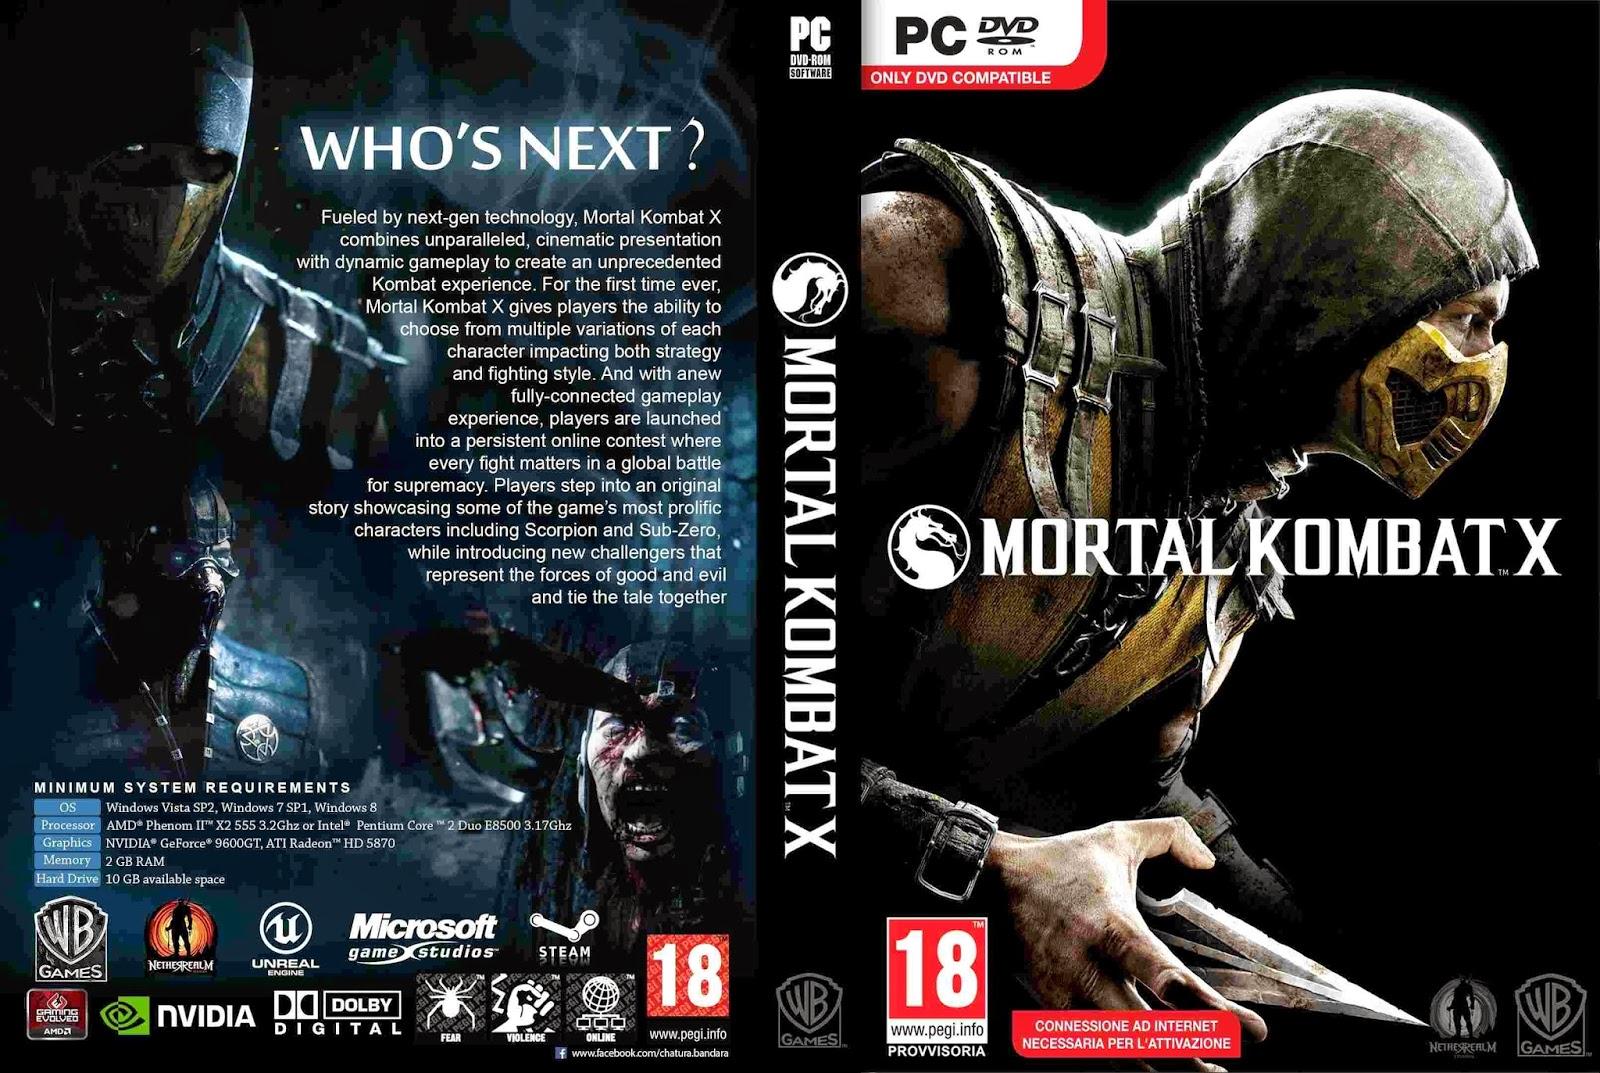 MEGA DAVID: Descargar Mortal Kombat X Complete [PCDVD